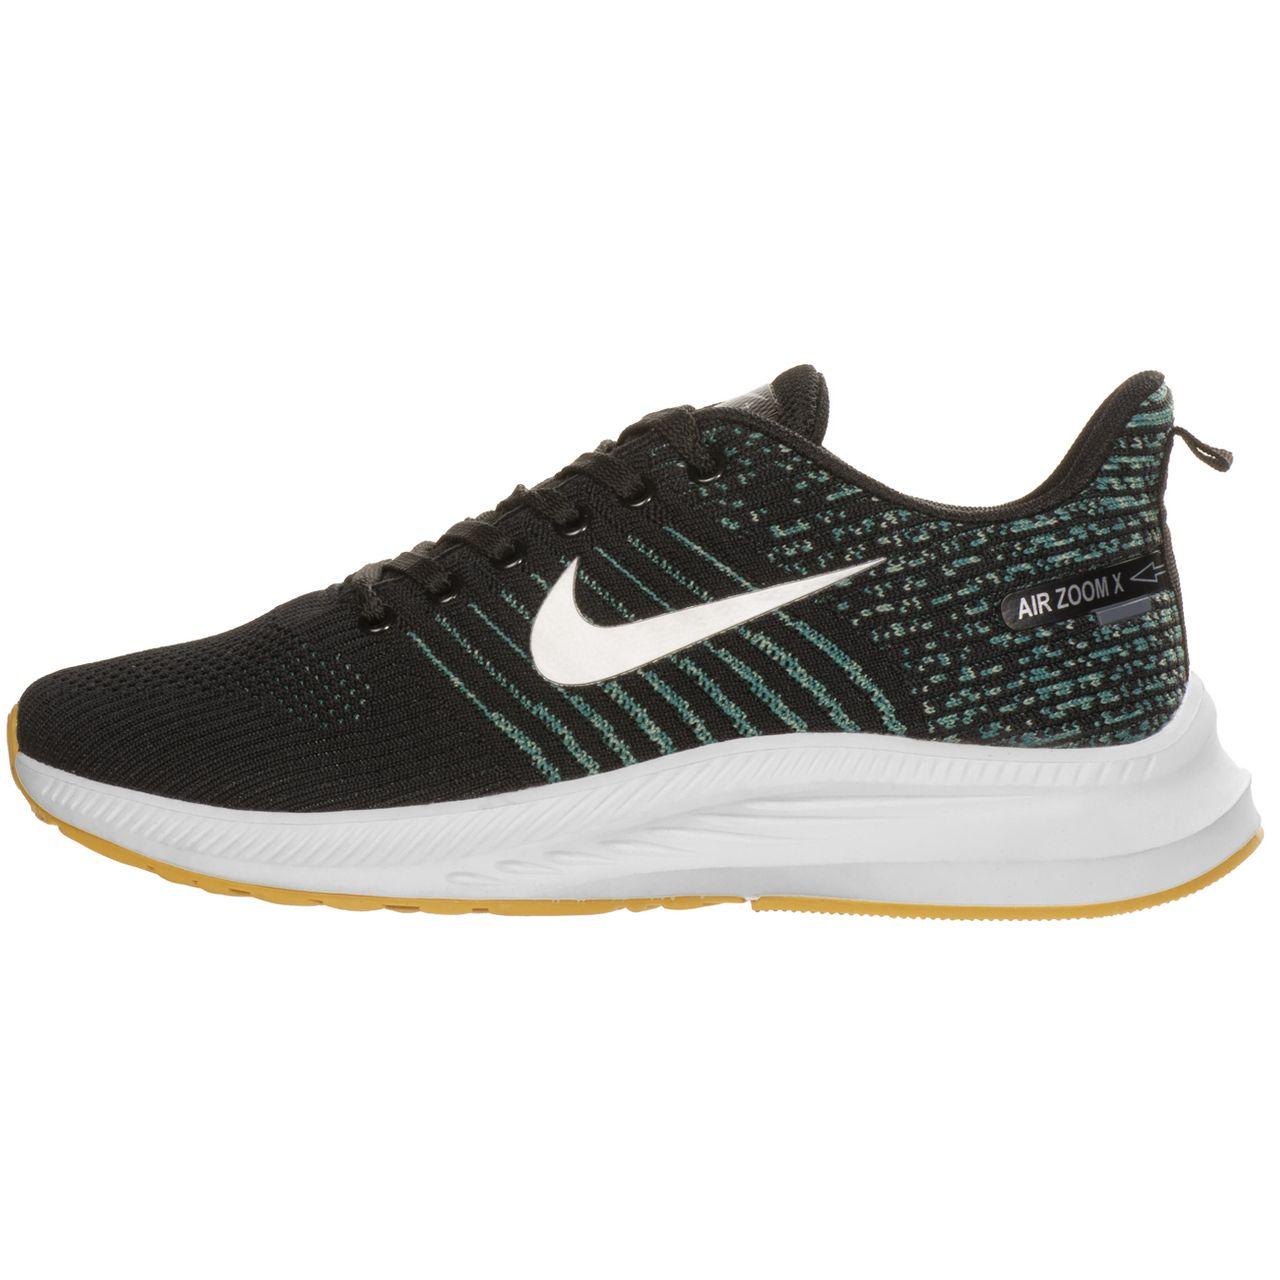 کفش مخصوص دویدن مردانه نایکی مدل AIR ZOOMX FLY BLKGRN-100005